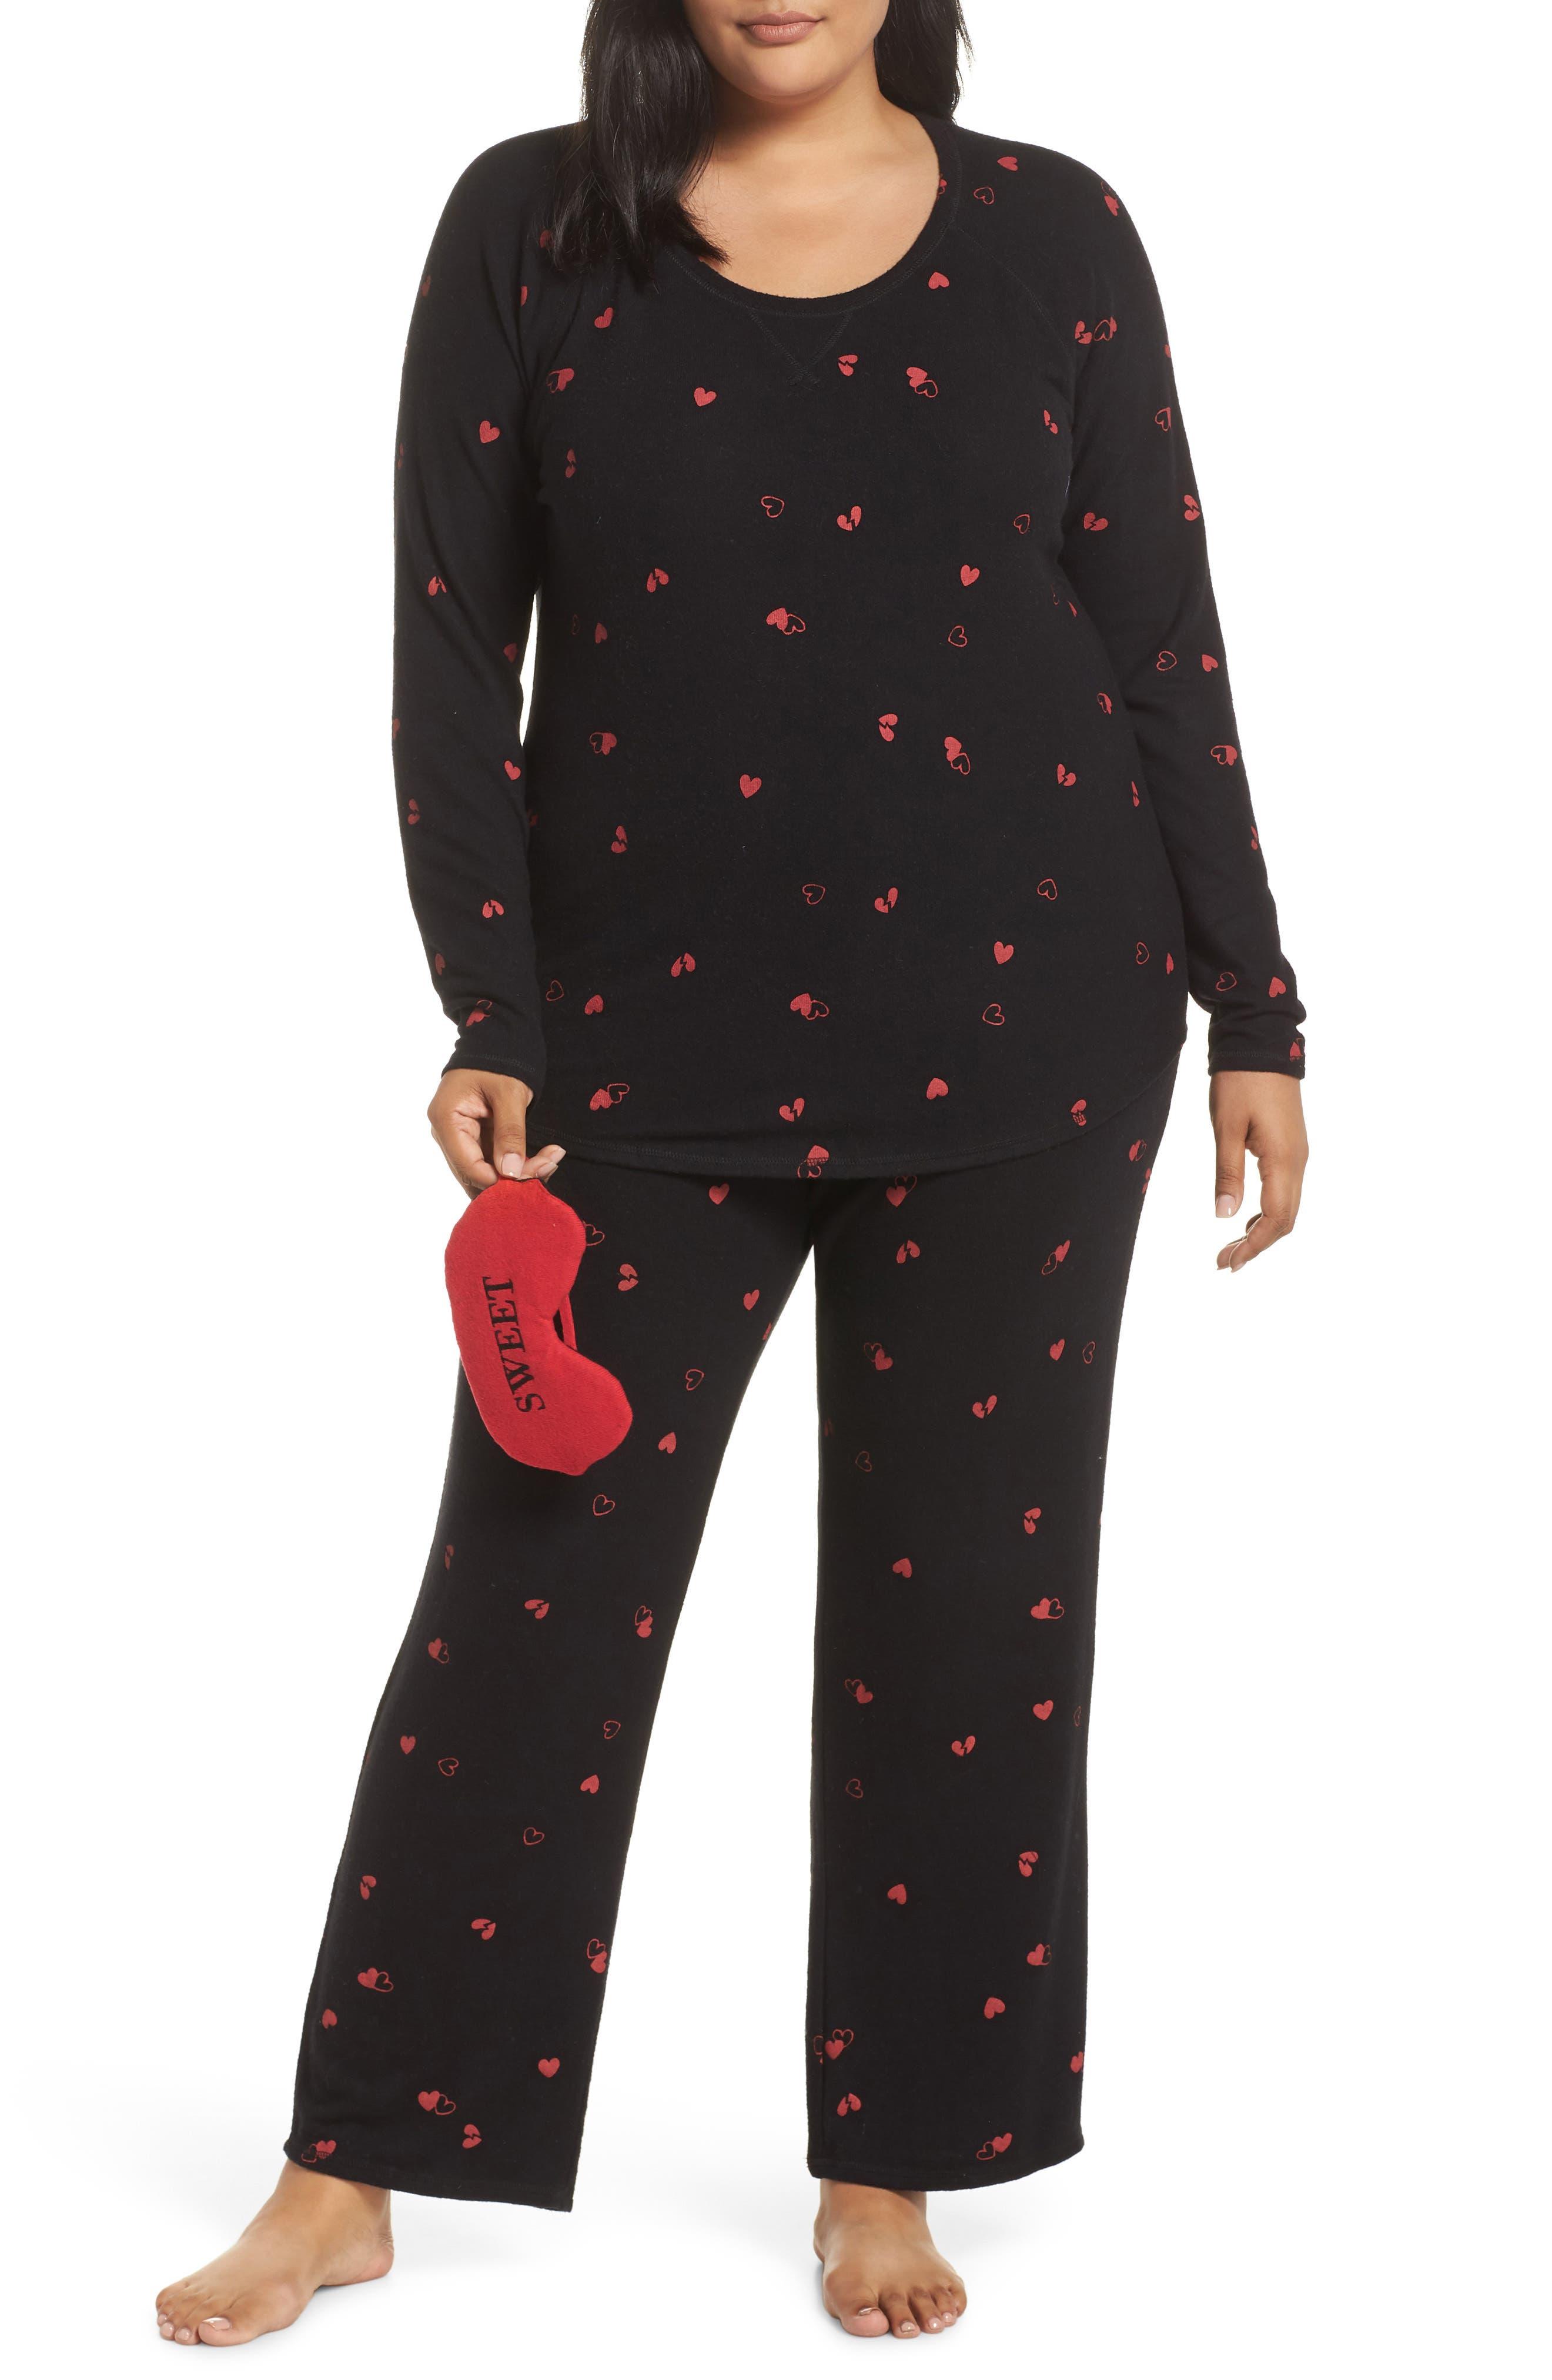 Plus Size Make + Model Knit Pajamas & Sleep Mask, Black